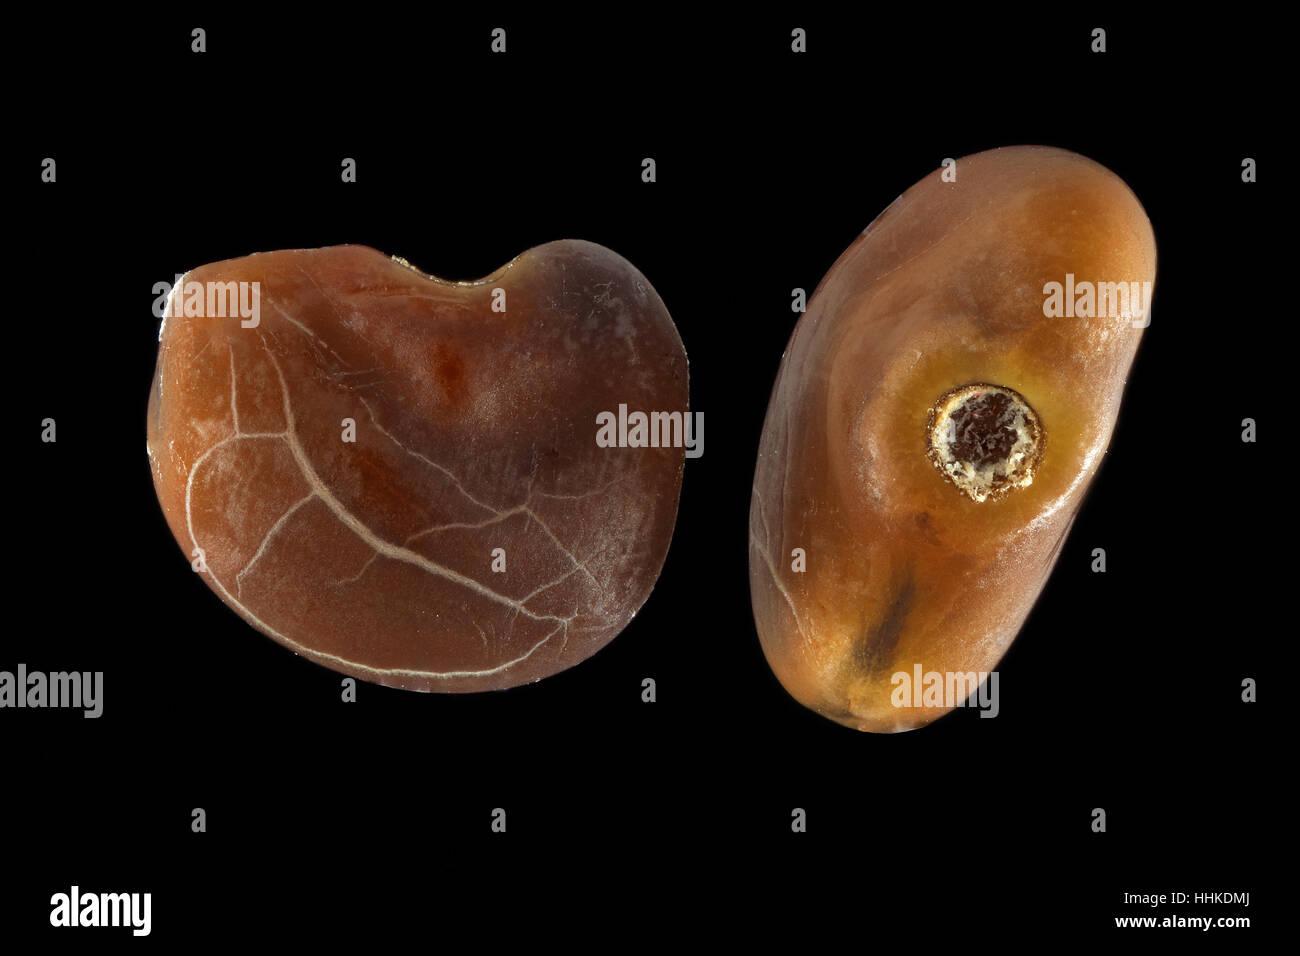 Glycyrrhiza glabra, Liquorice, Echtes Süssholz, seeds, close up, seed size 2.0-2.5 mm Stock Photo